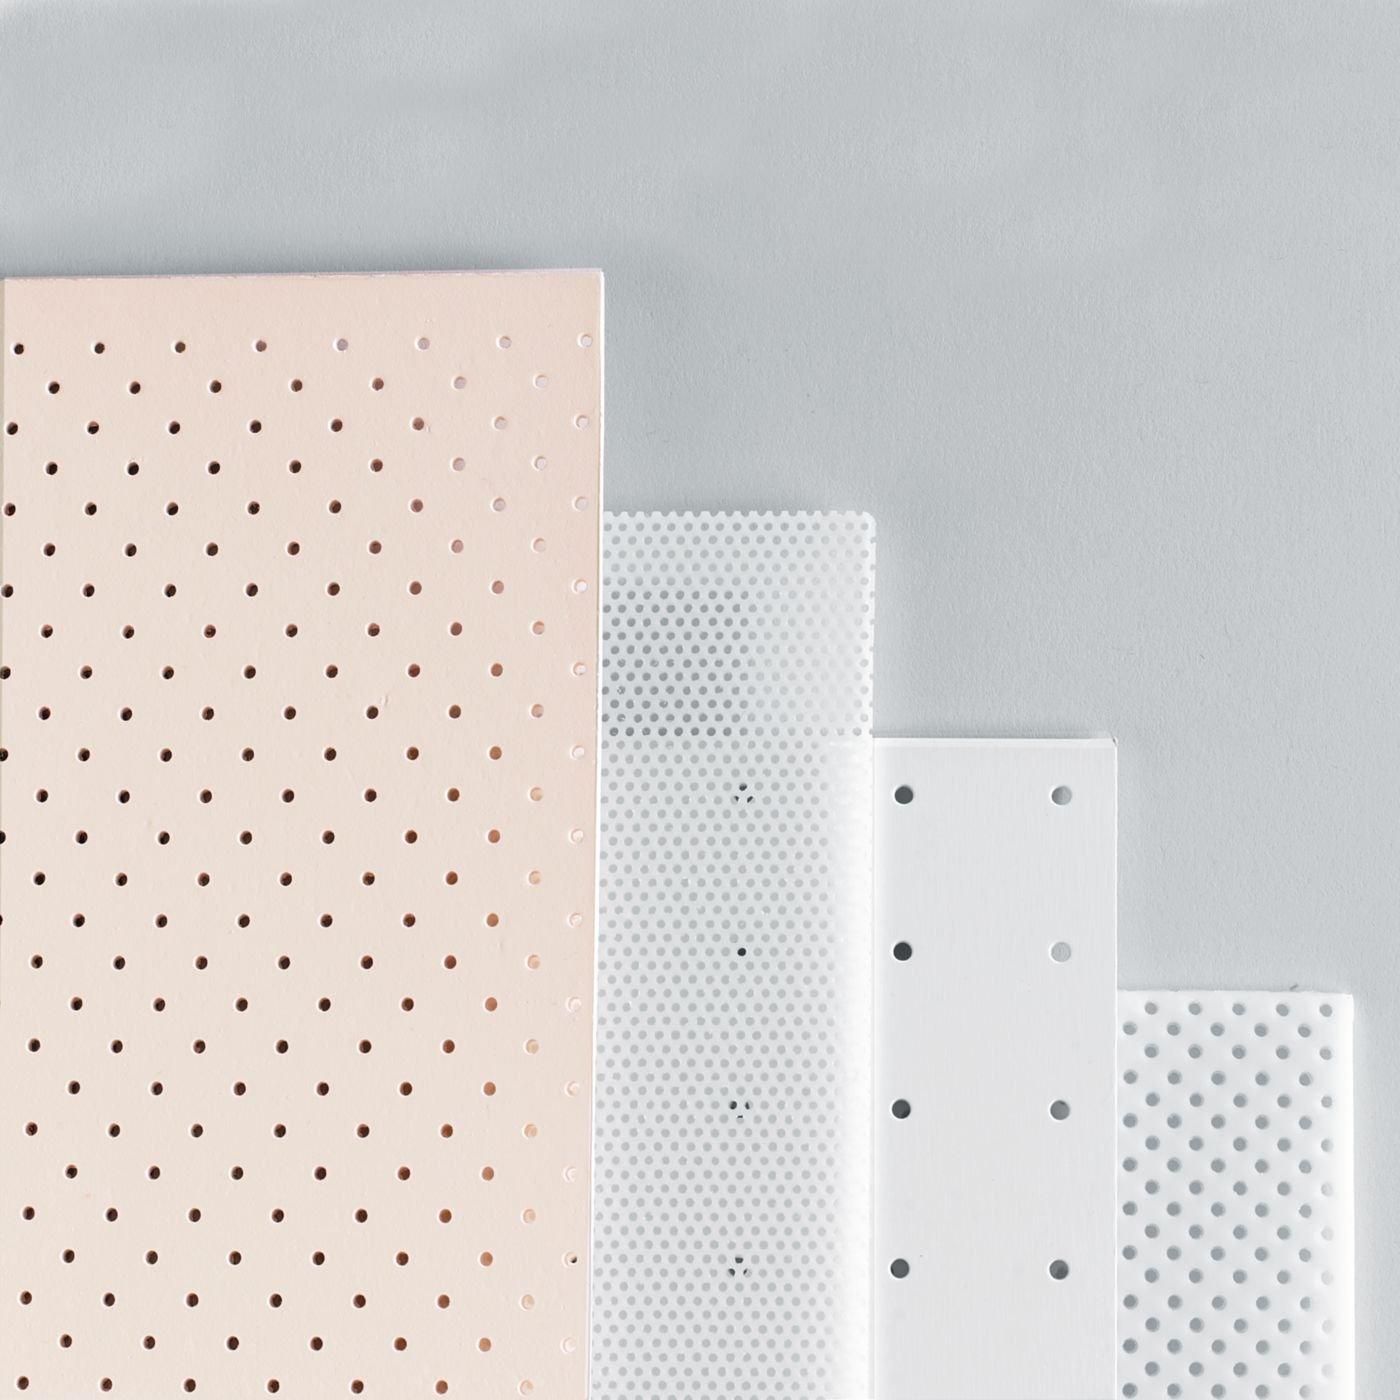 Rolyan Small Splinting Materials, Clinic Pack B, 4 Sheets, 1 Each Tailorsplint 1% Perforated, Polyflex II Solid, Aquaplast-T Optiperf, Ezeform 1% Perforated